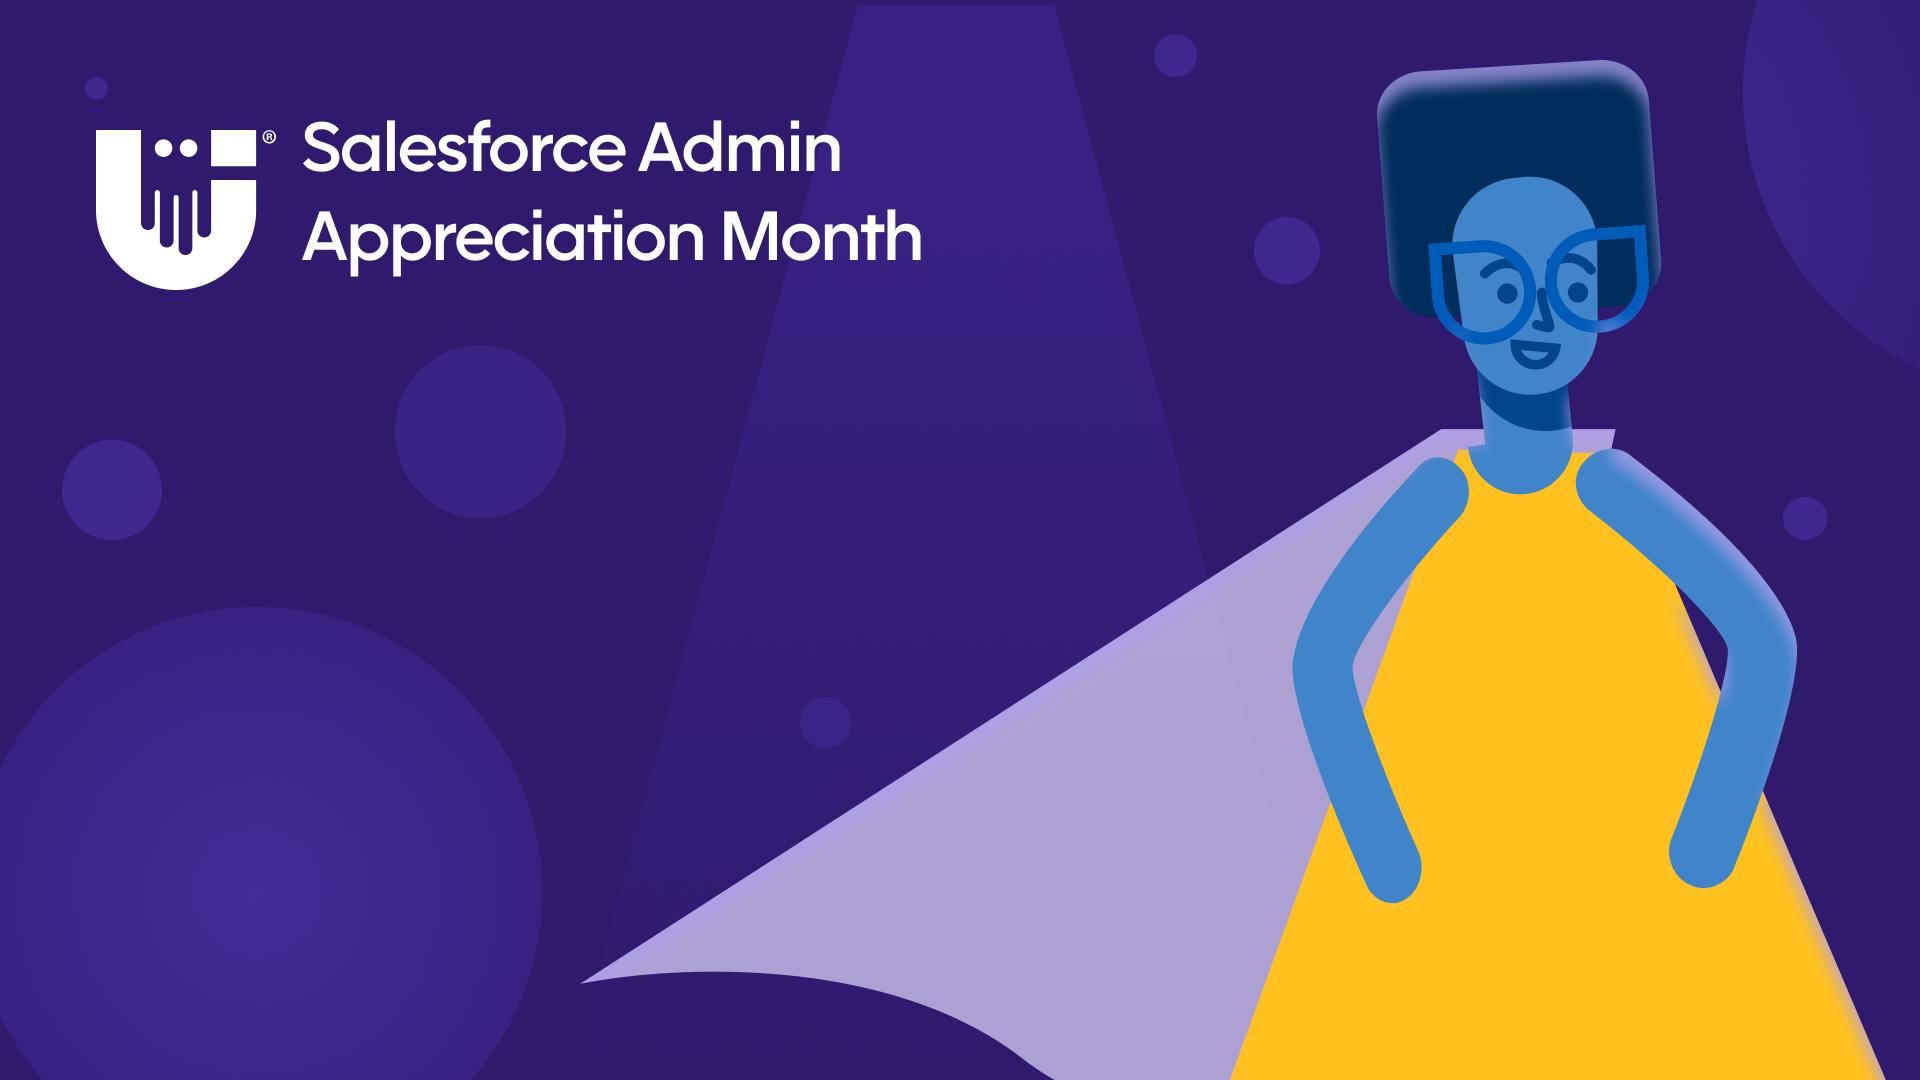 Salesforce admin appreciation month - woman in yellow dress wearing cape on a purple background.